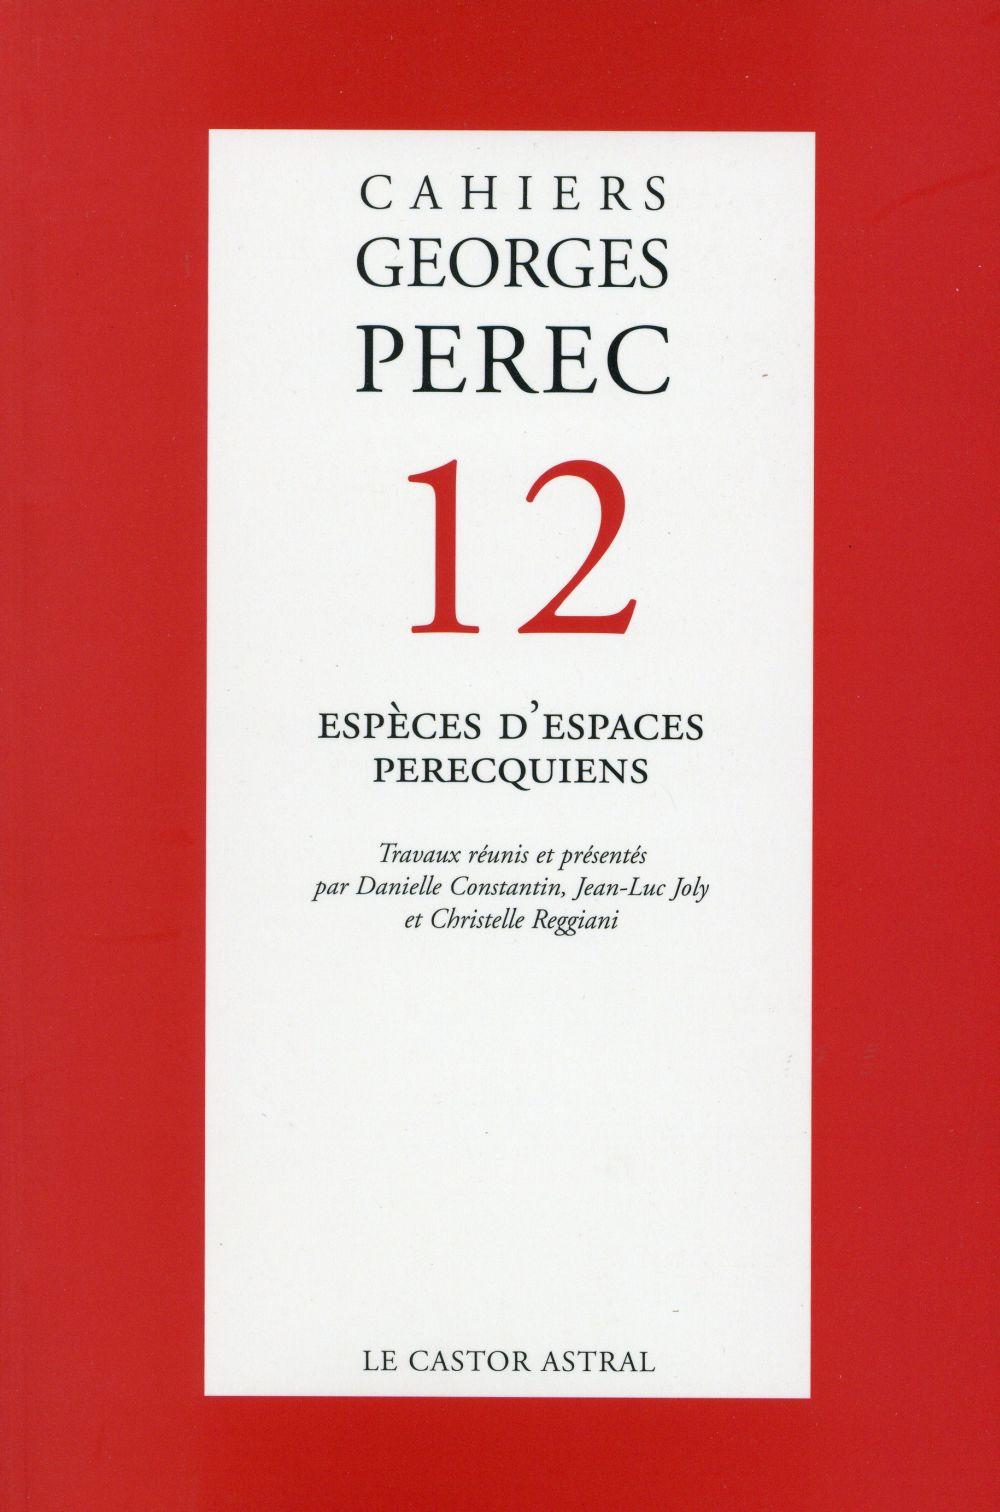 LES CAHIERS GEORGES PEREC N 12 - ESPECES D'ESPACES PERECQUIENS